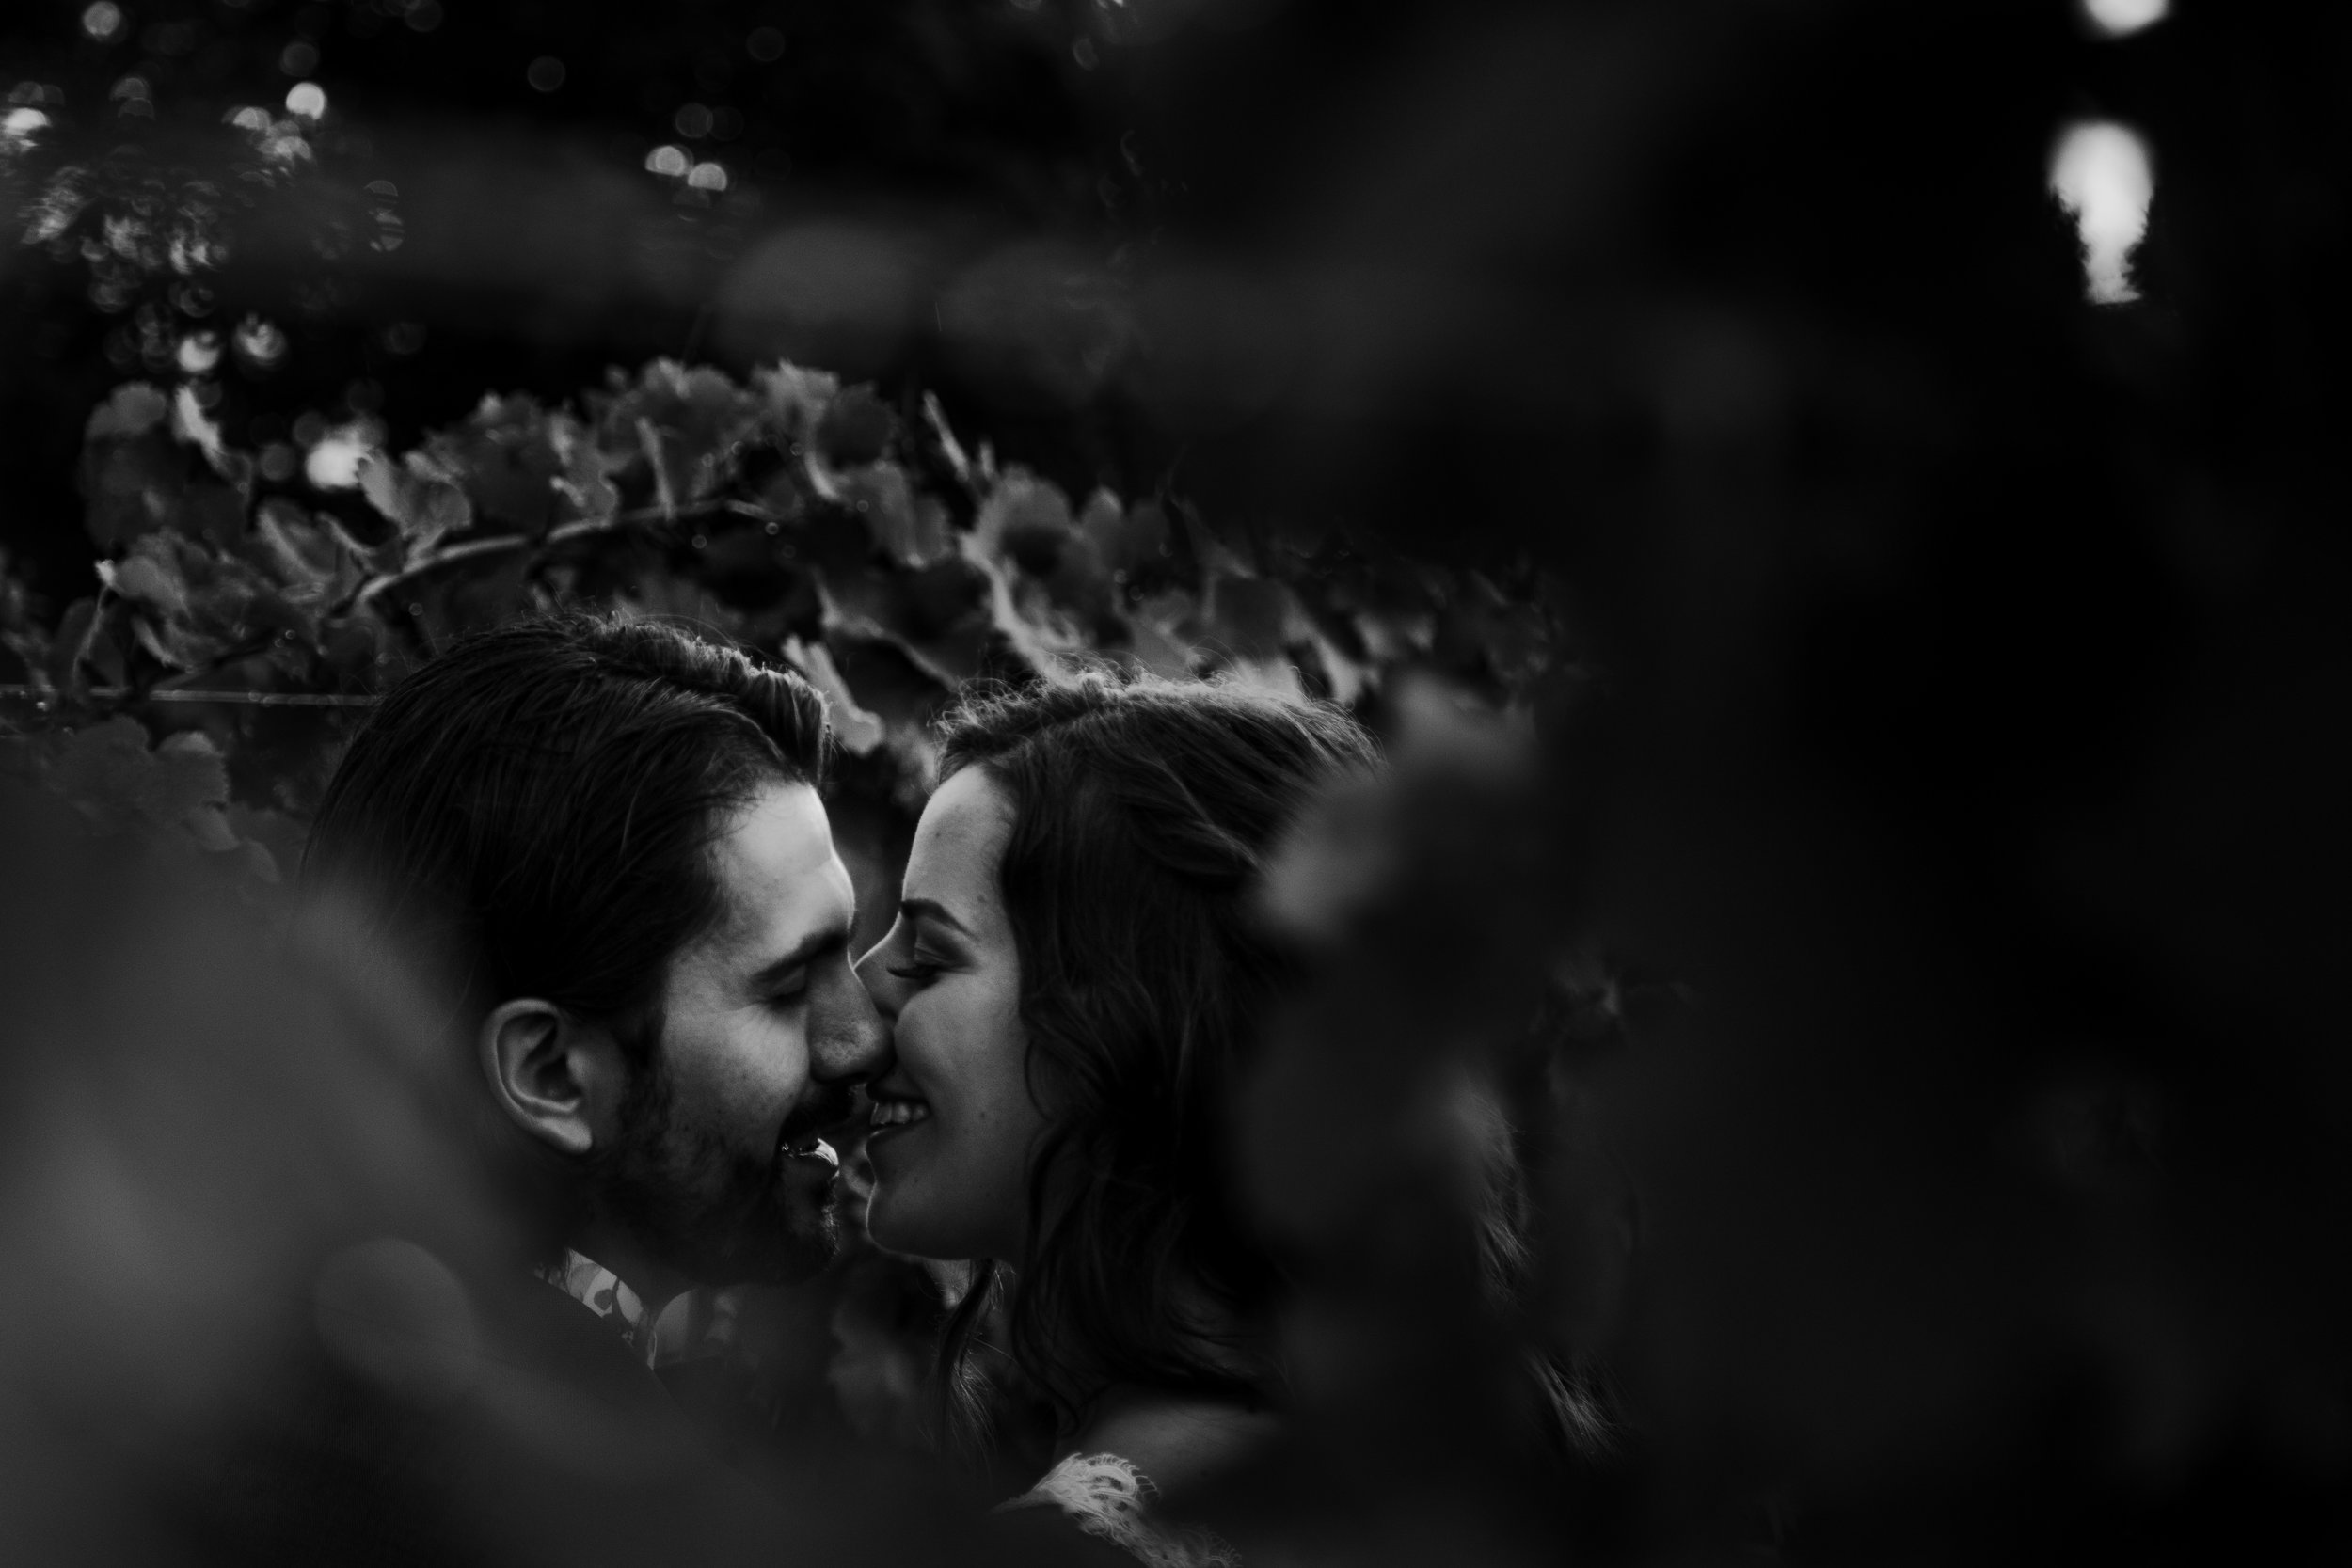 kelowna-wedding-photographer-28.jpg